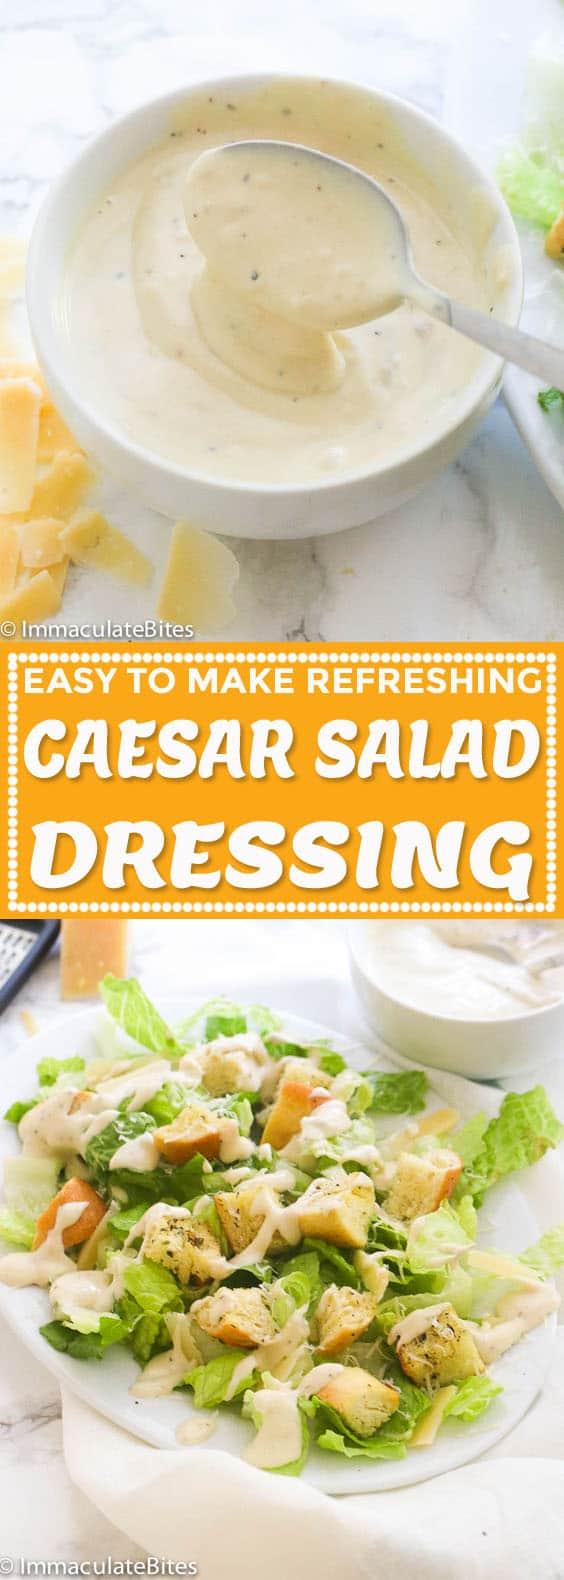 Caesar Salad Dressing Immaculate Bites